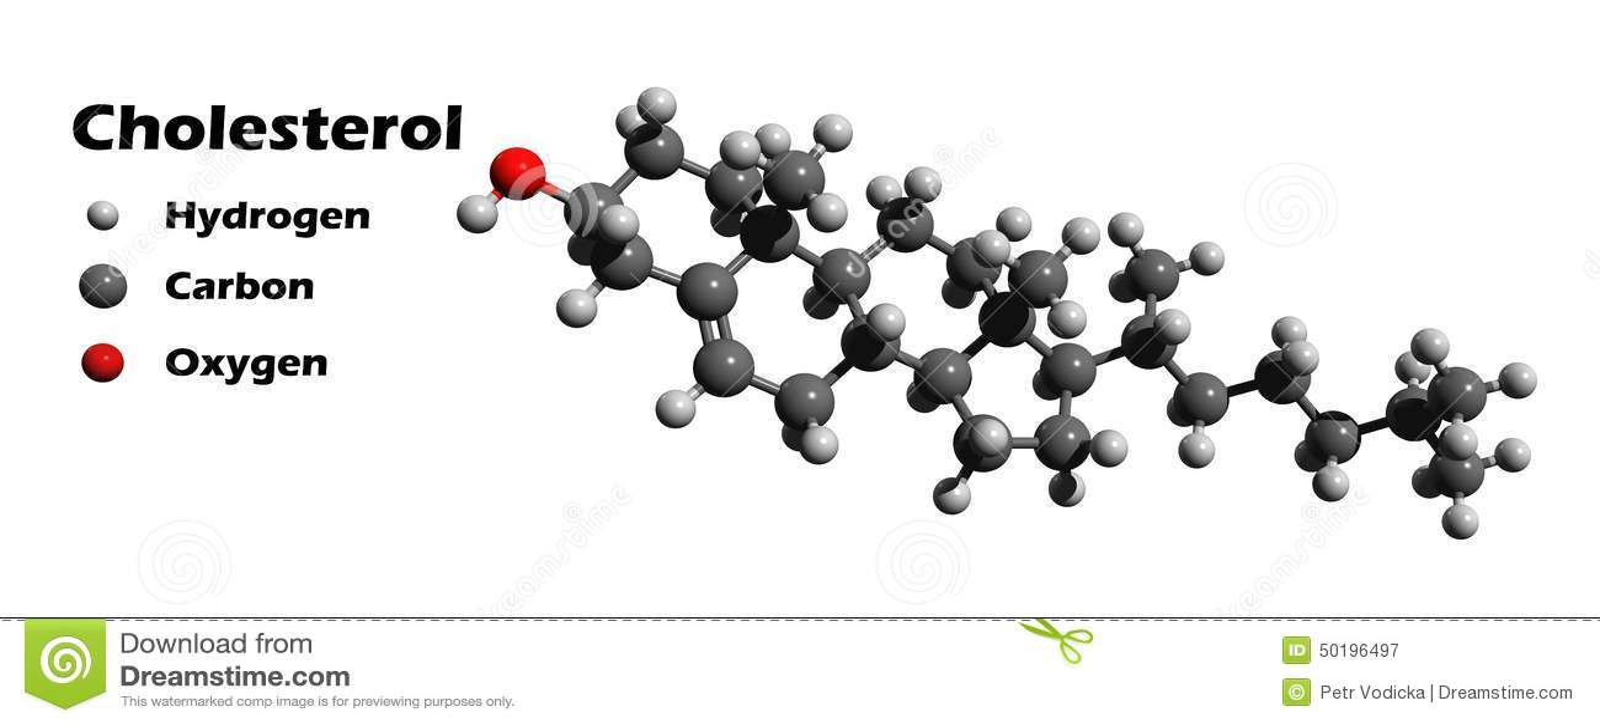 cholesterol d molecular structure 50196497